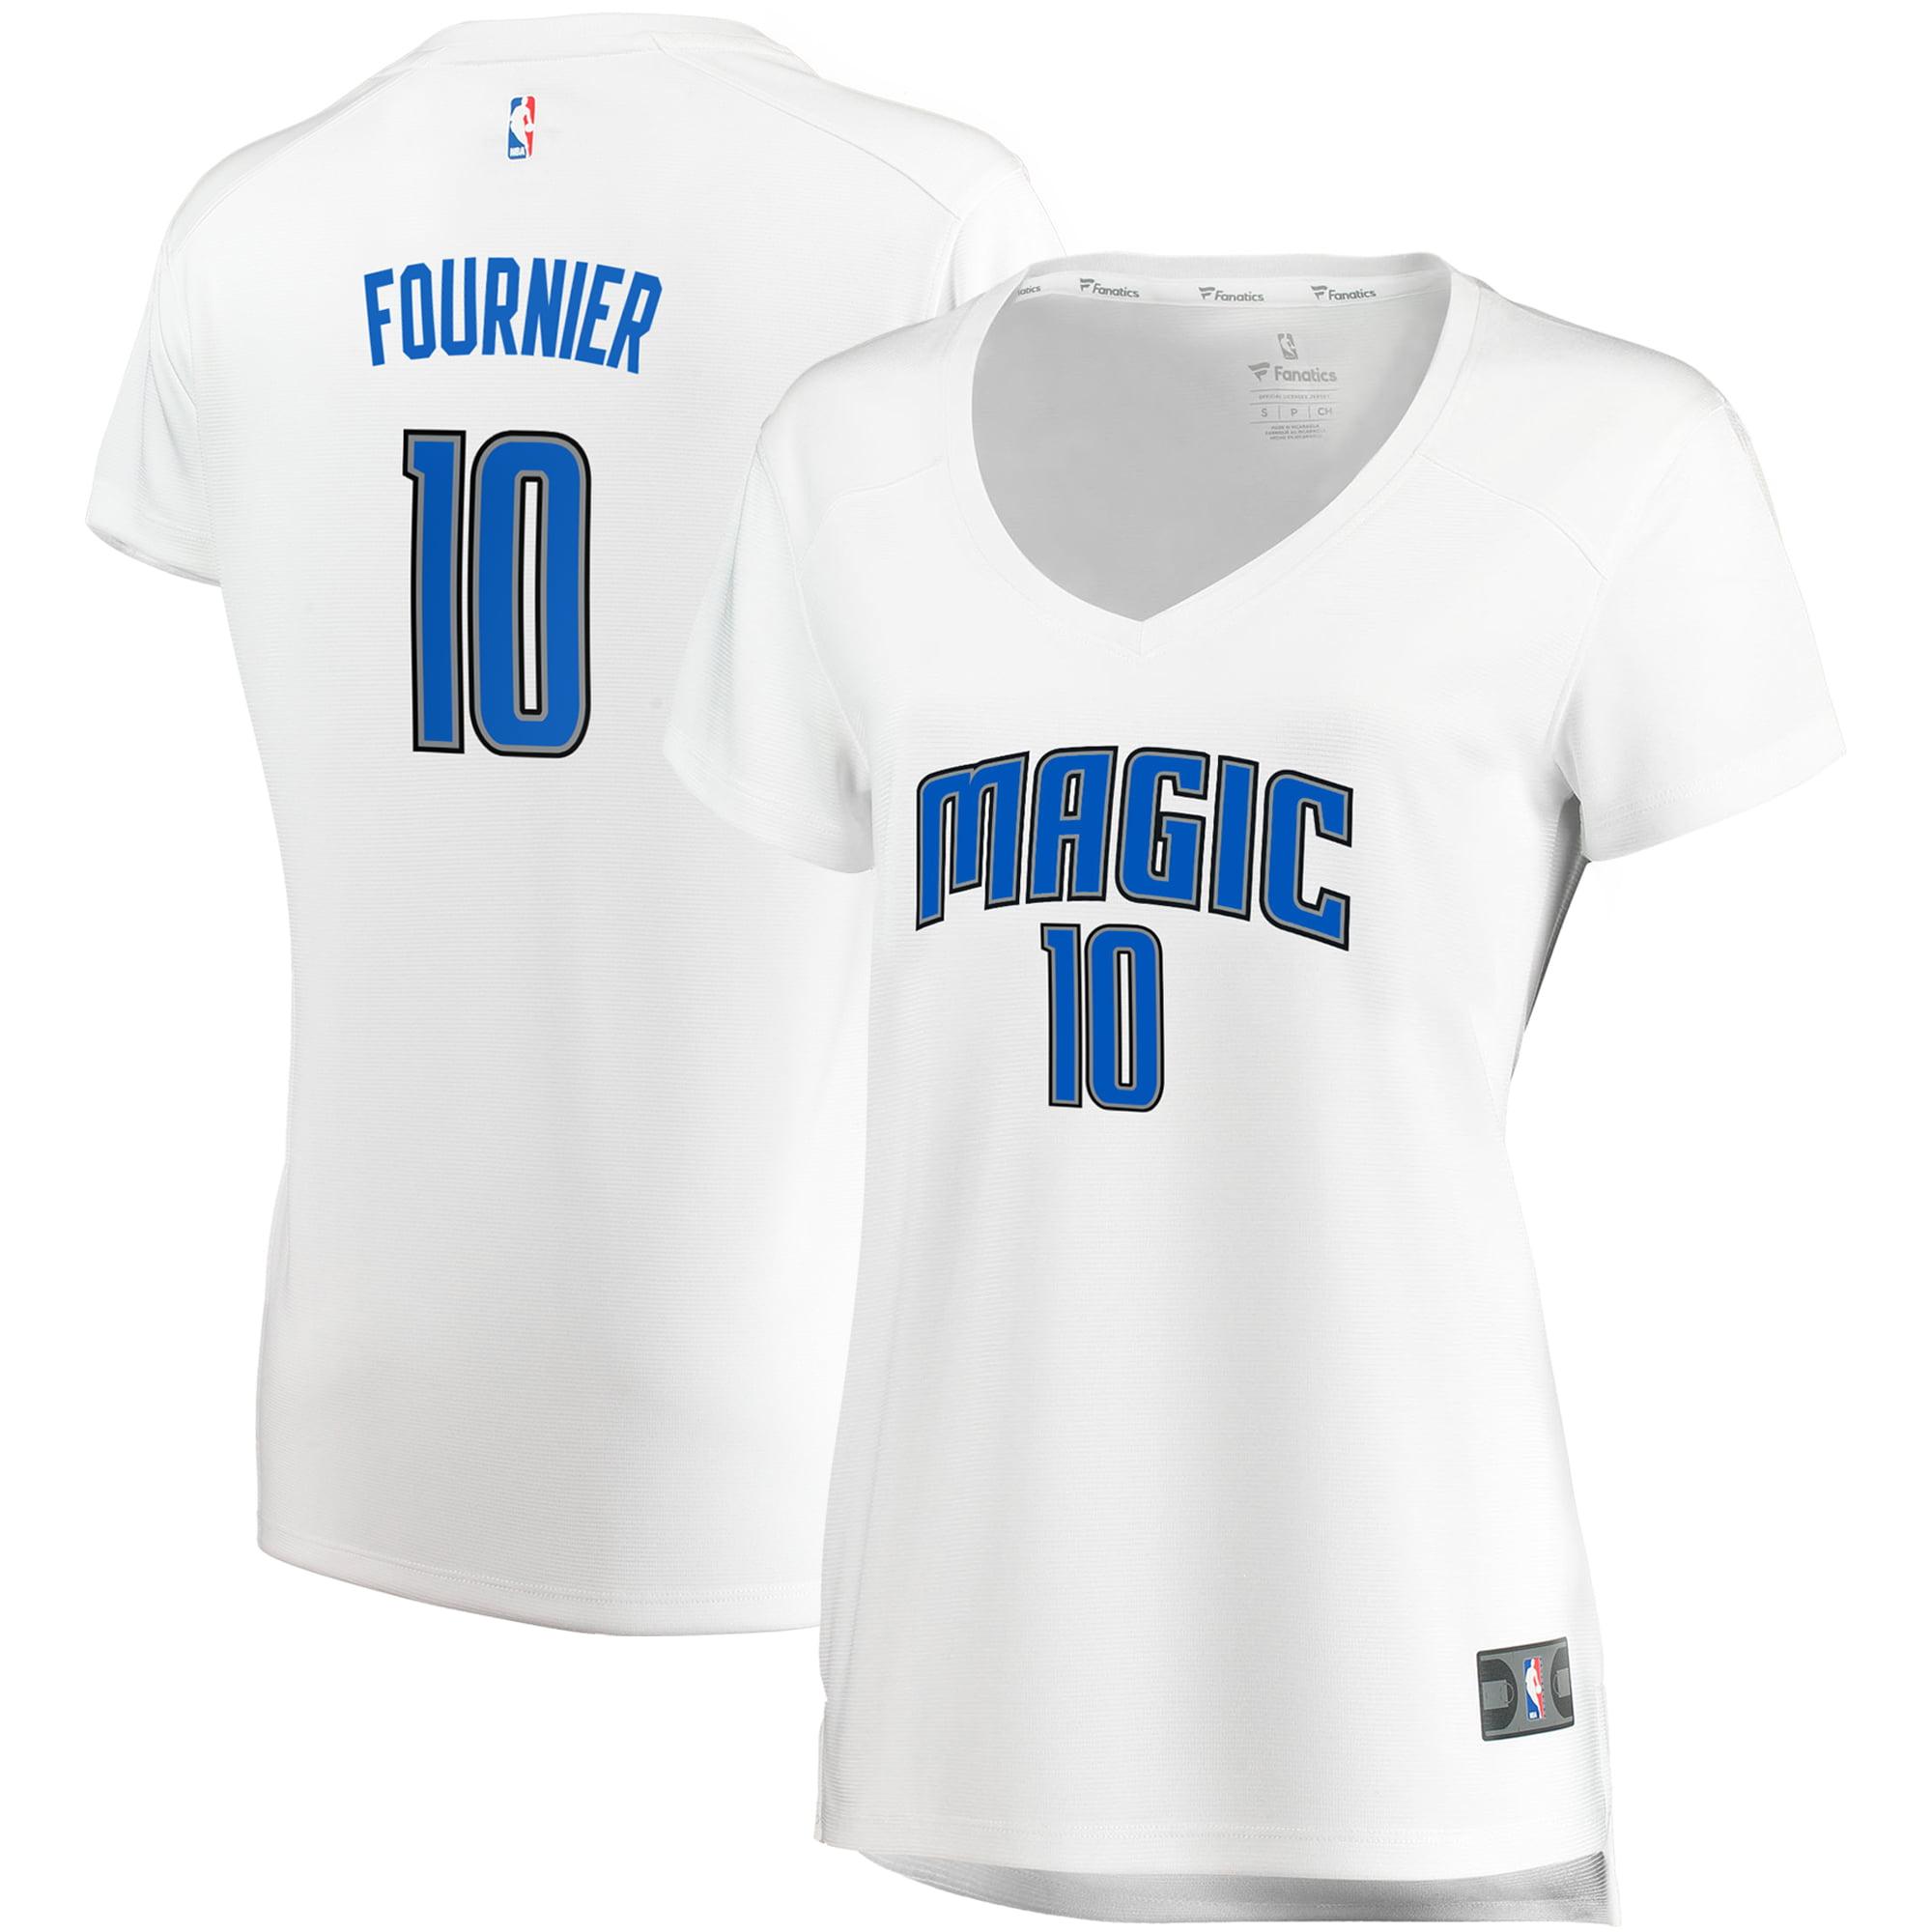 Evan Fournier Orlando Magic Fanatics Branded Women's Fast Break Replica Jersey White - Association Edition